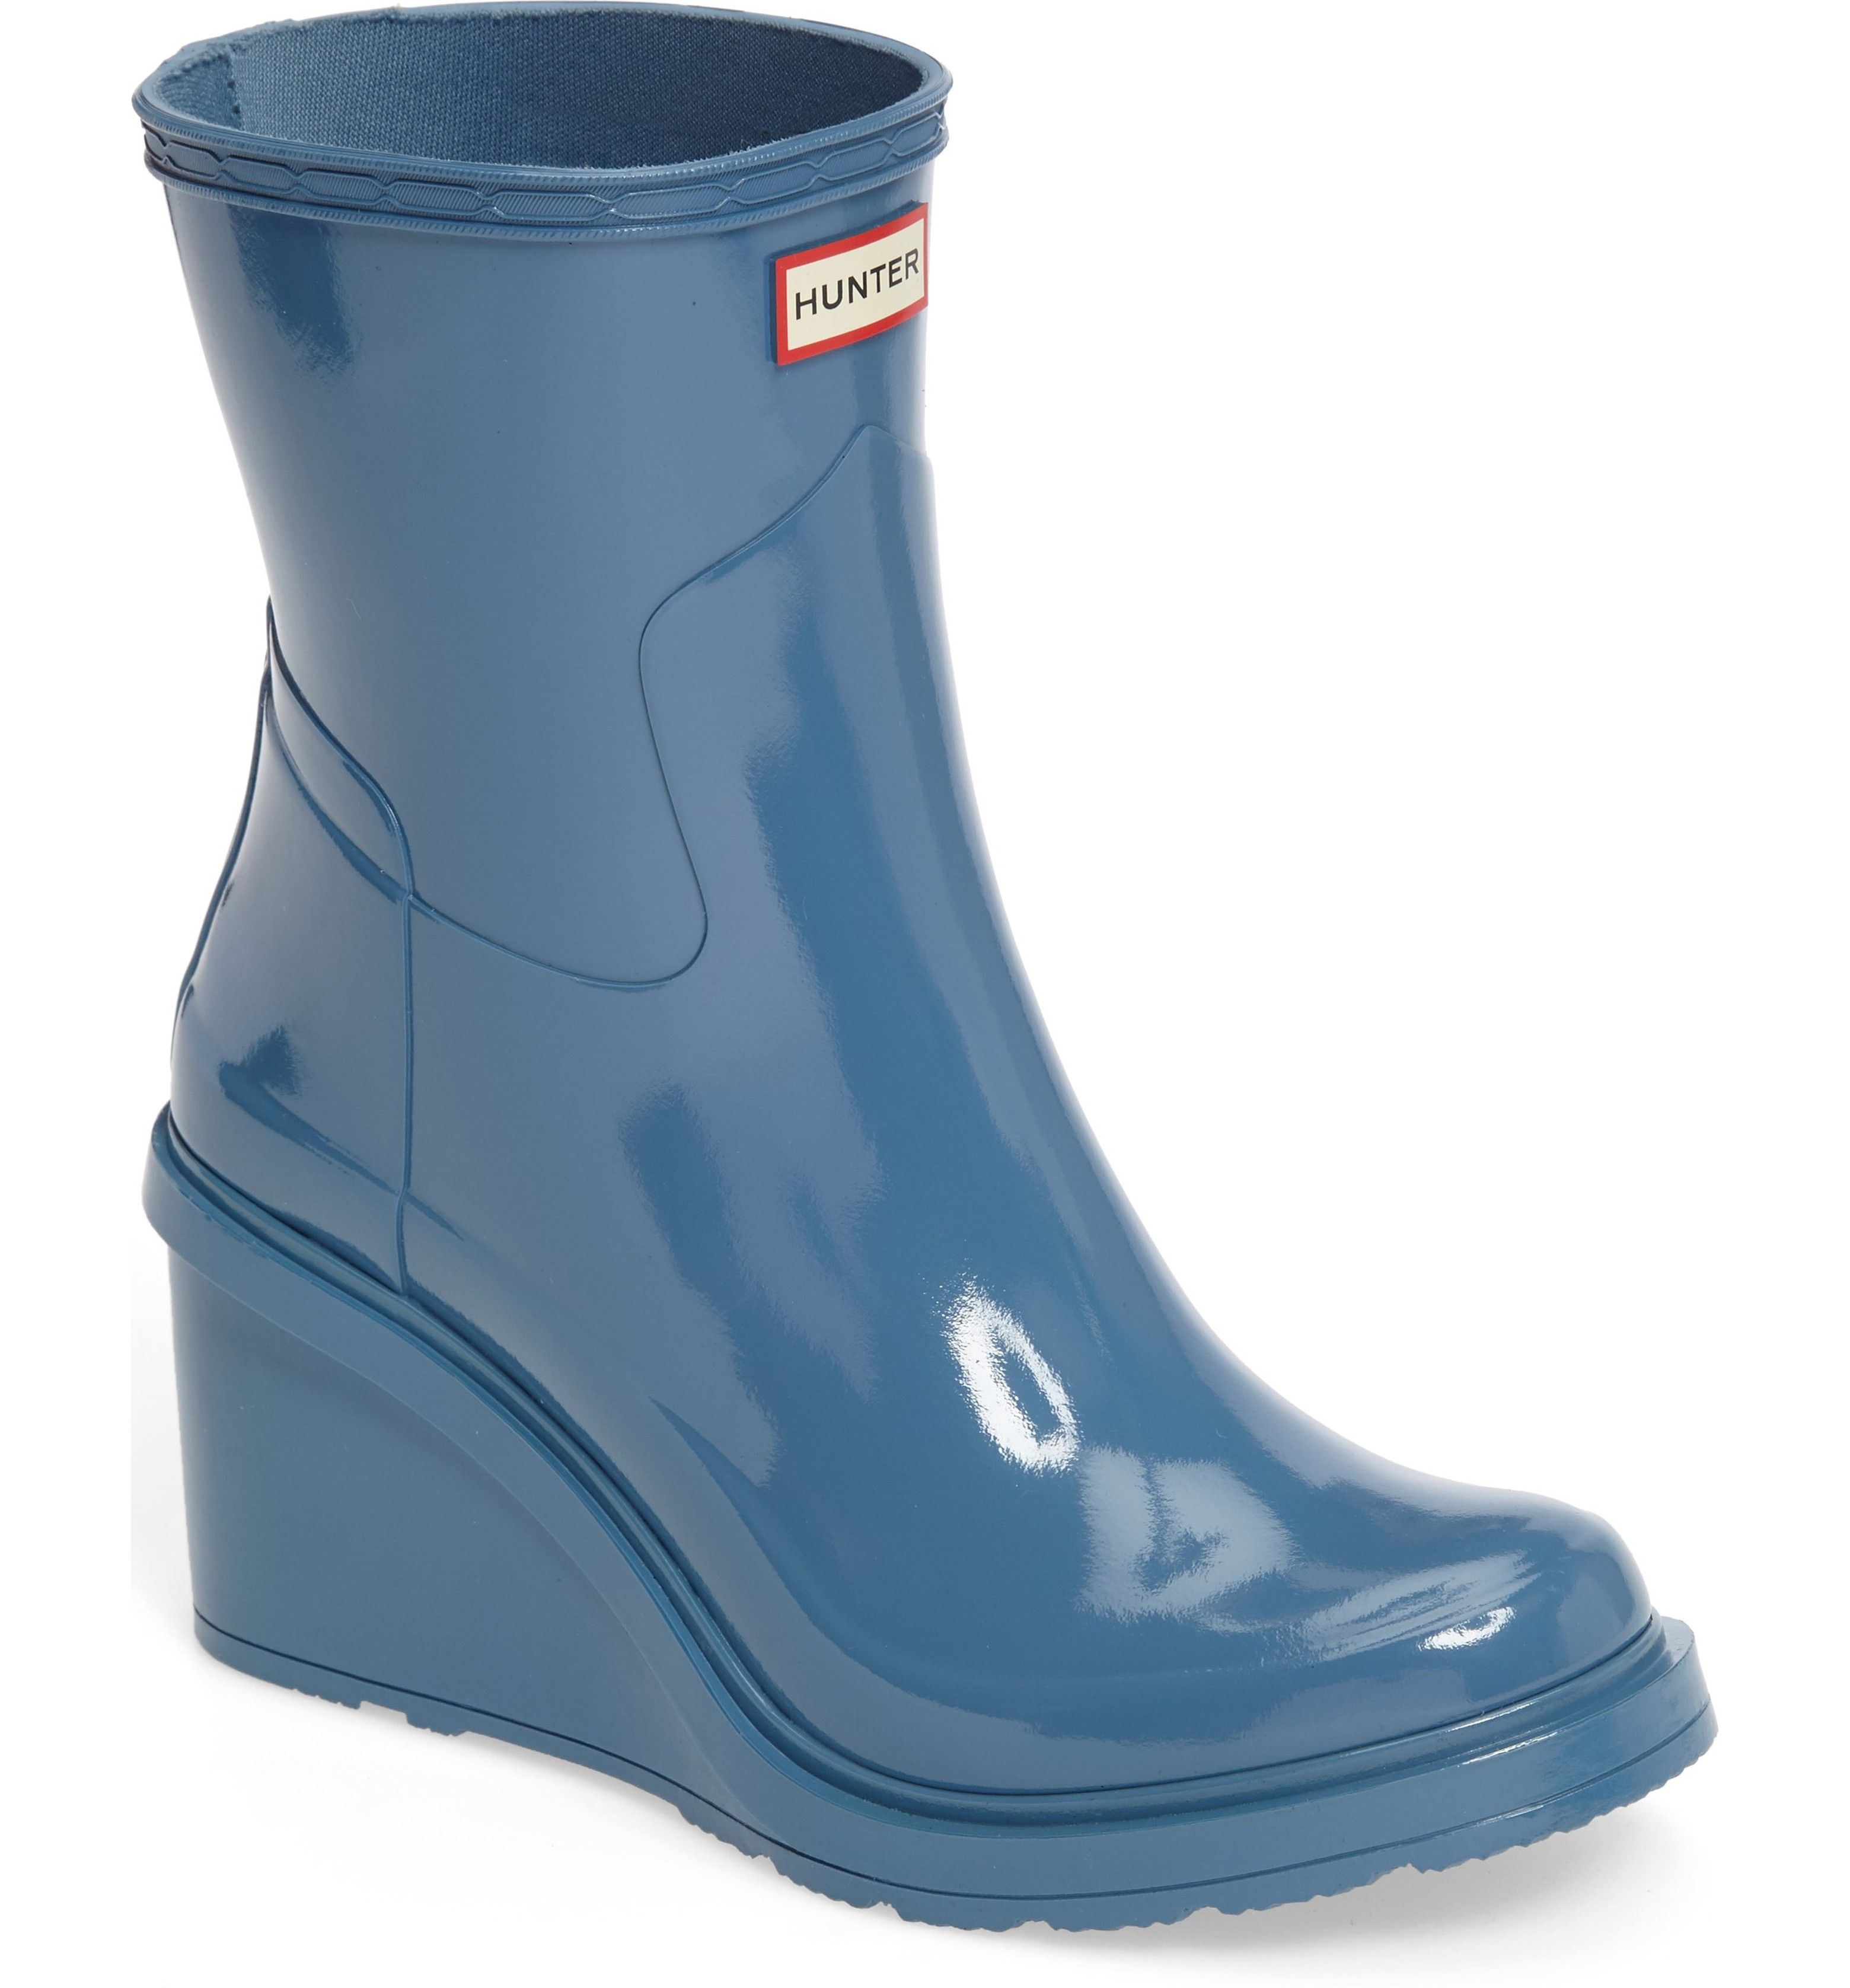 ff2207db67a2 Main Image - Hunter Original Refined Wedge Rain Boot (Women)